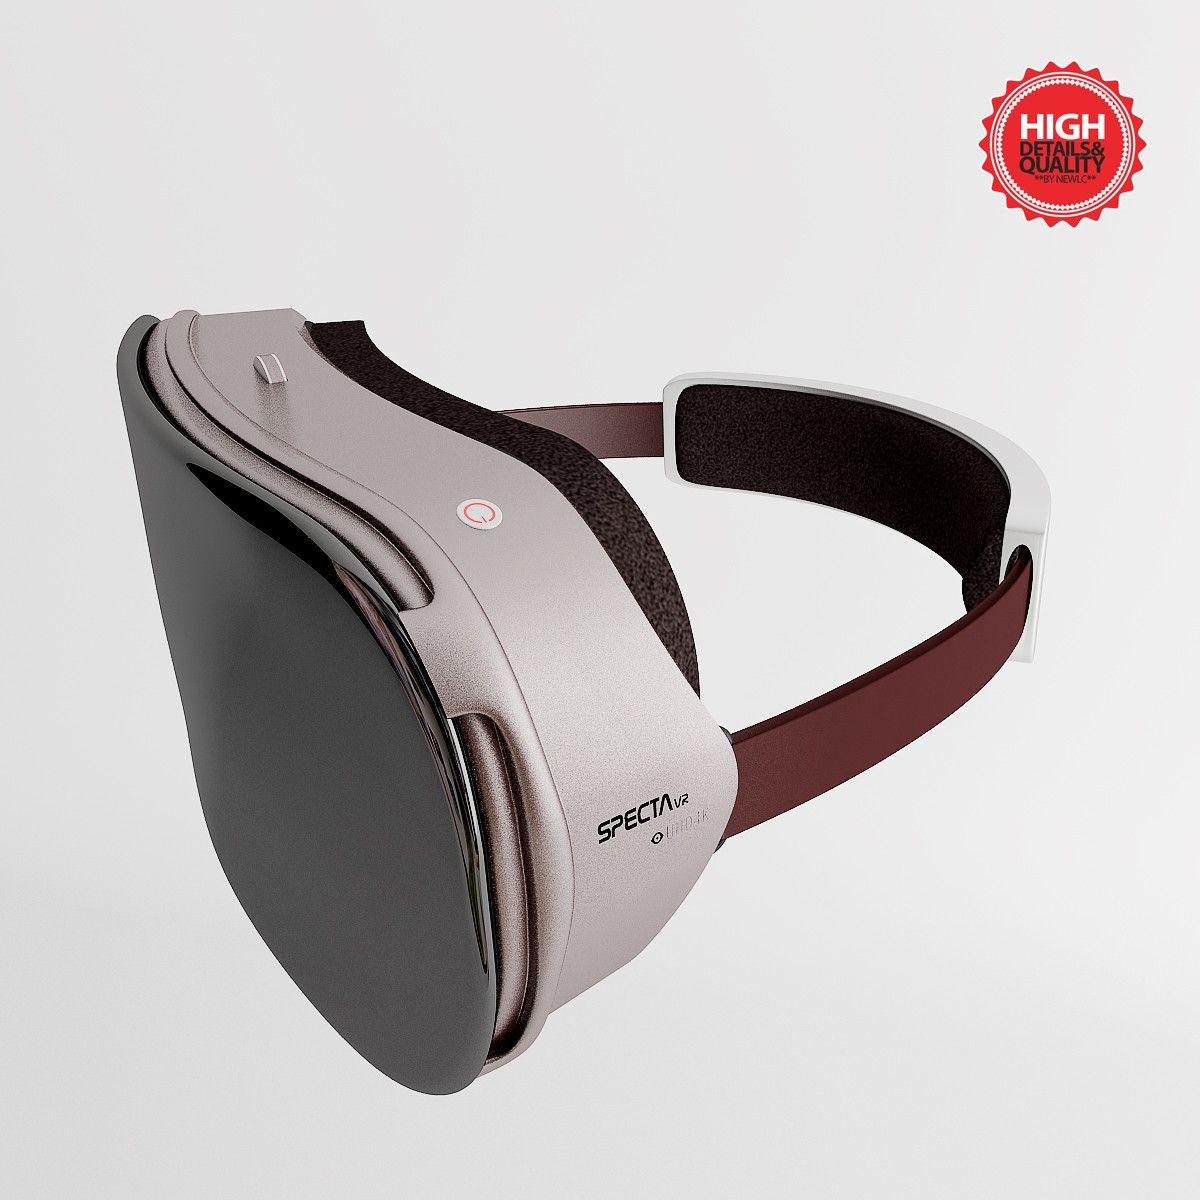 c4d virtual glasses